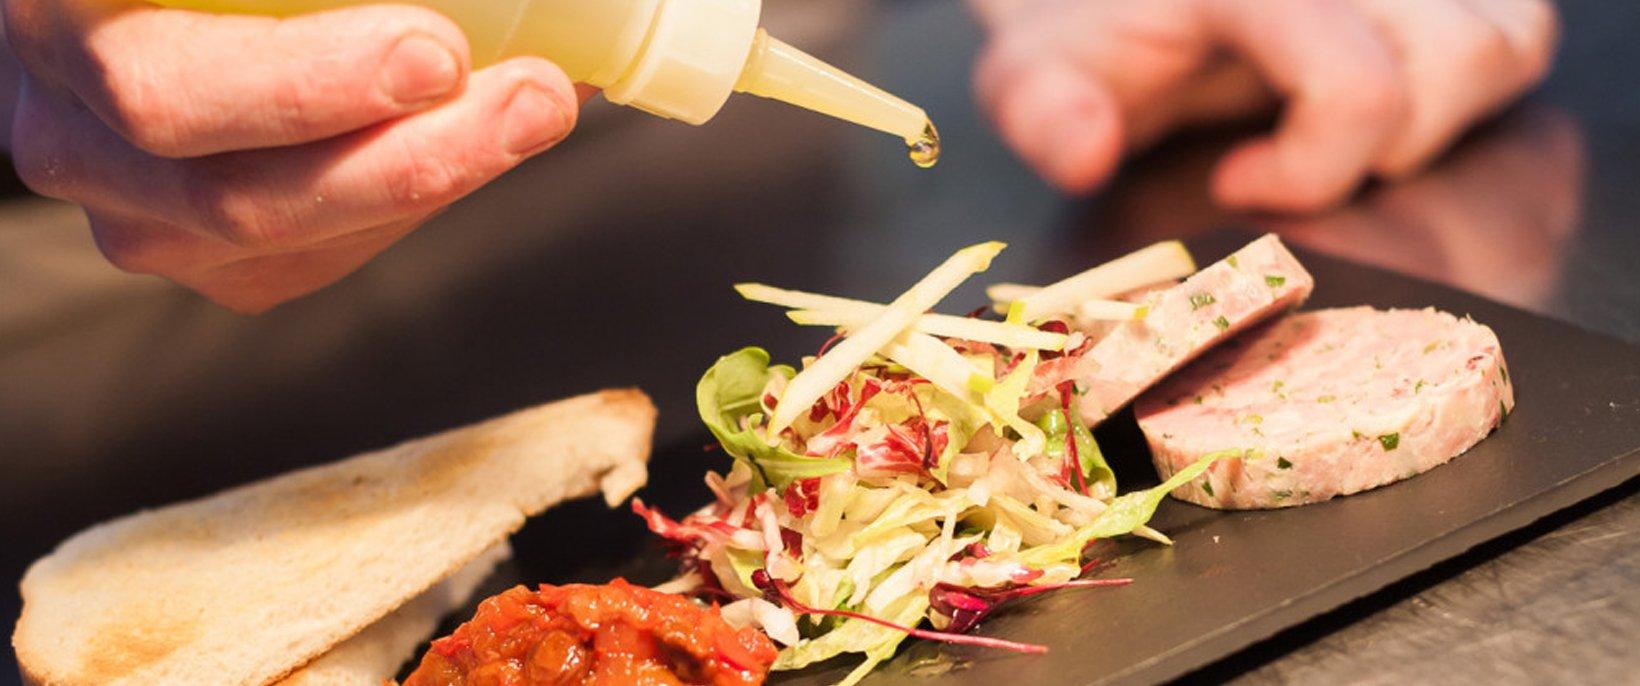 Bruschetta, salsa and salad